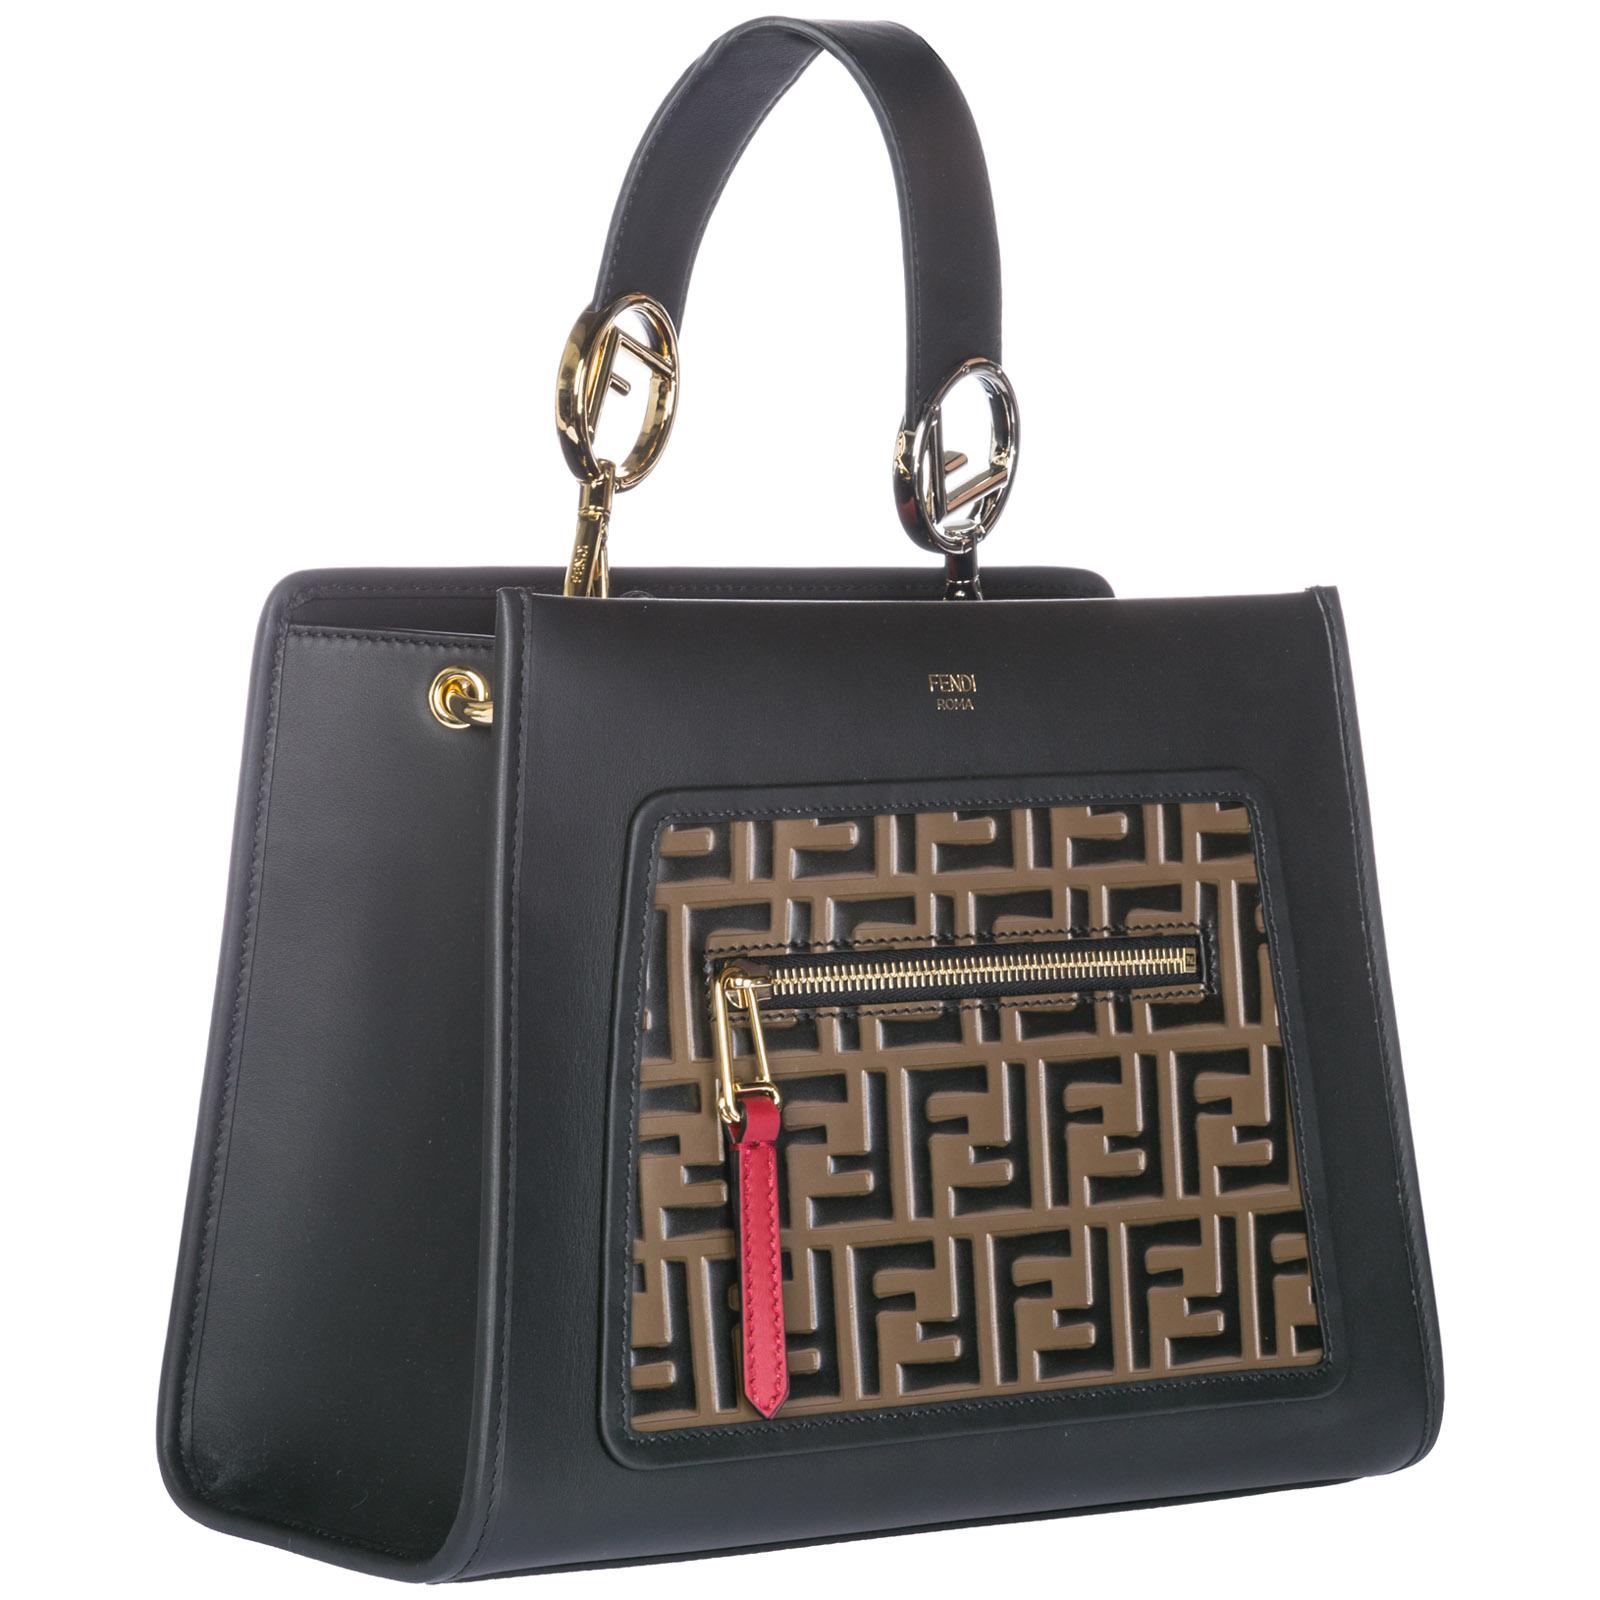 Fendi Women s handbag shopping bag purse tote in pelle runaway small 57d85a3f5609c